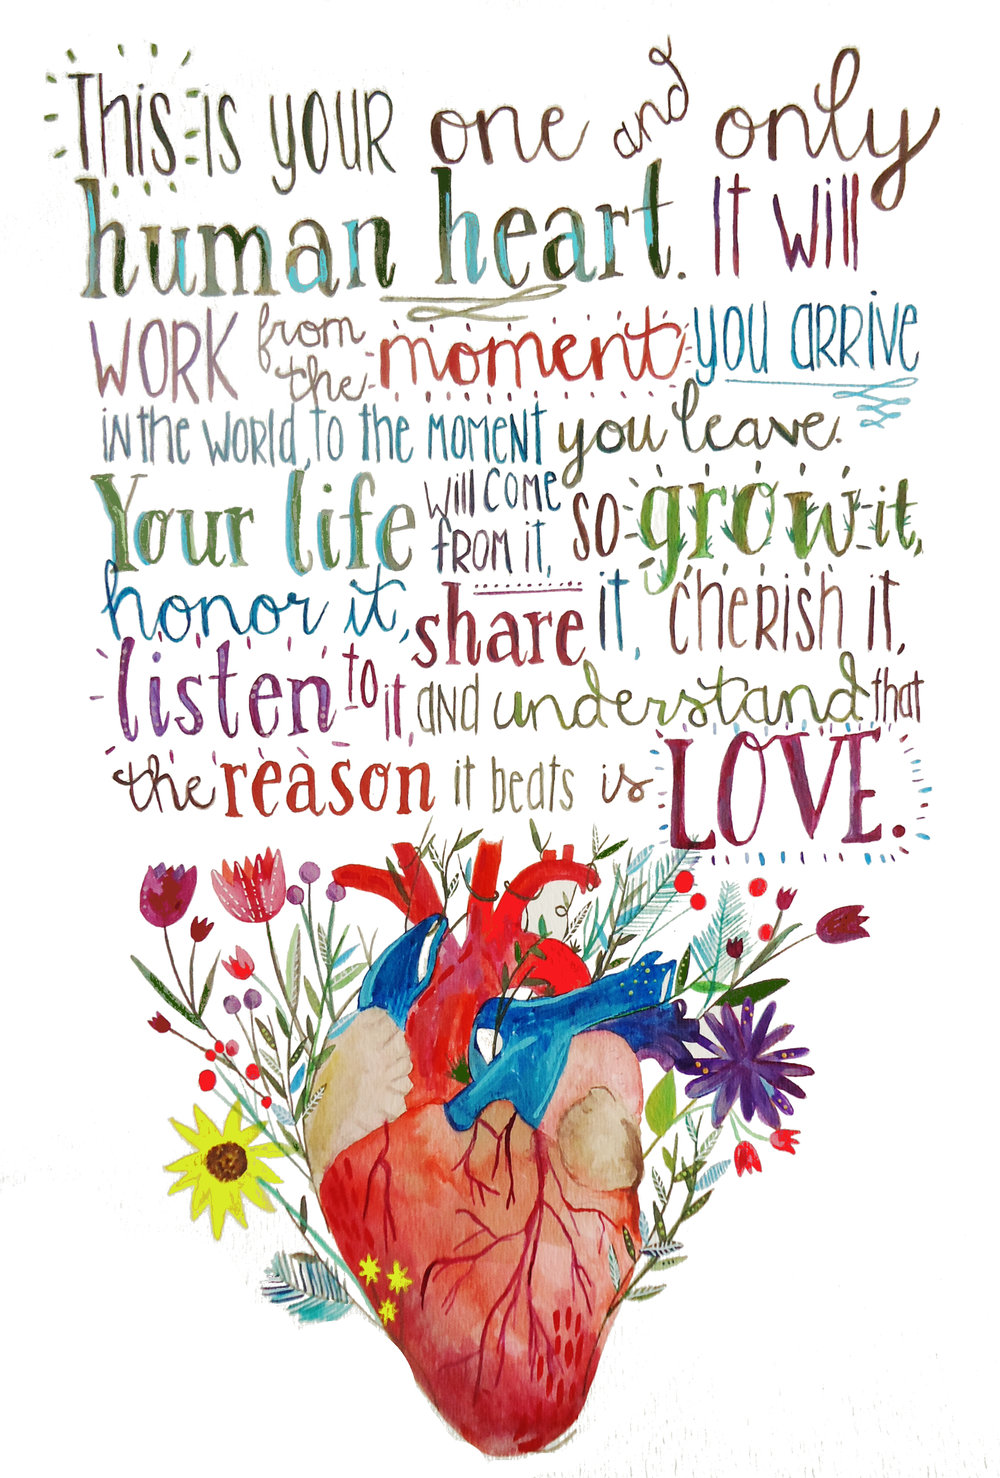 humanheart.JPG